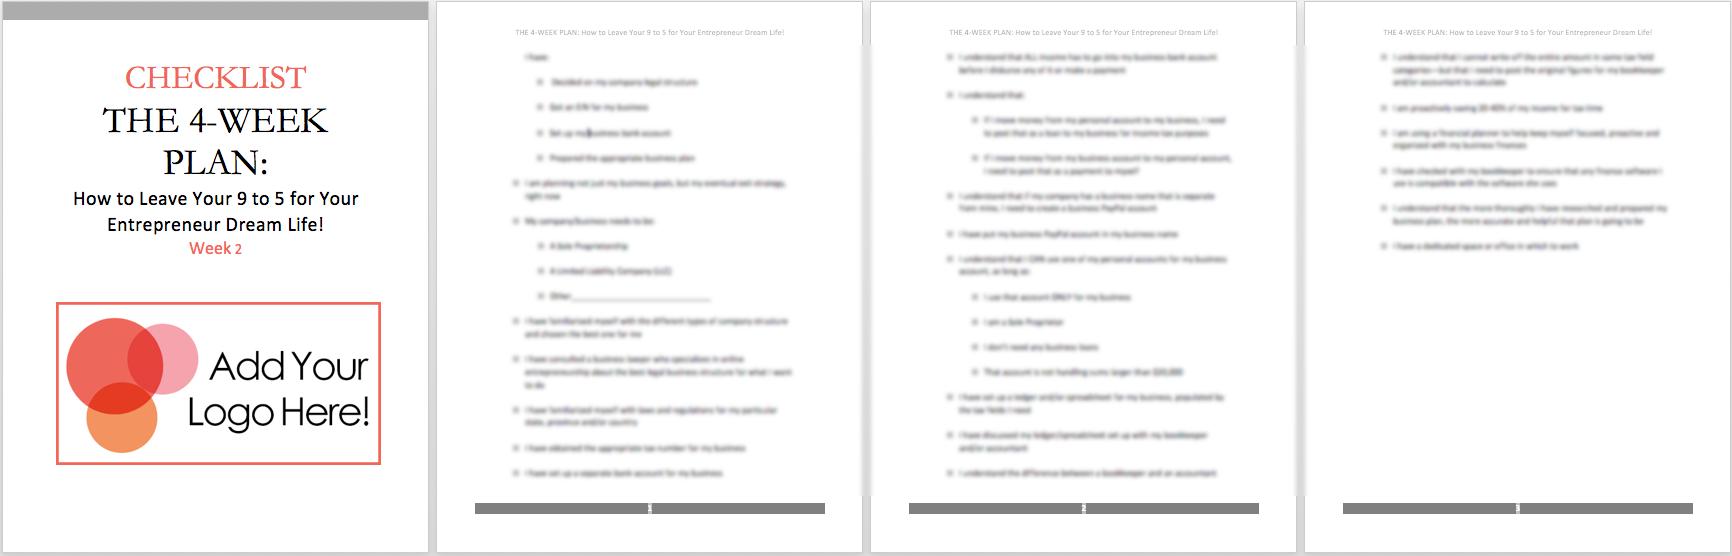 2-checklist